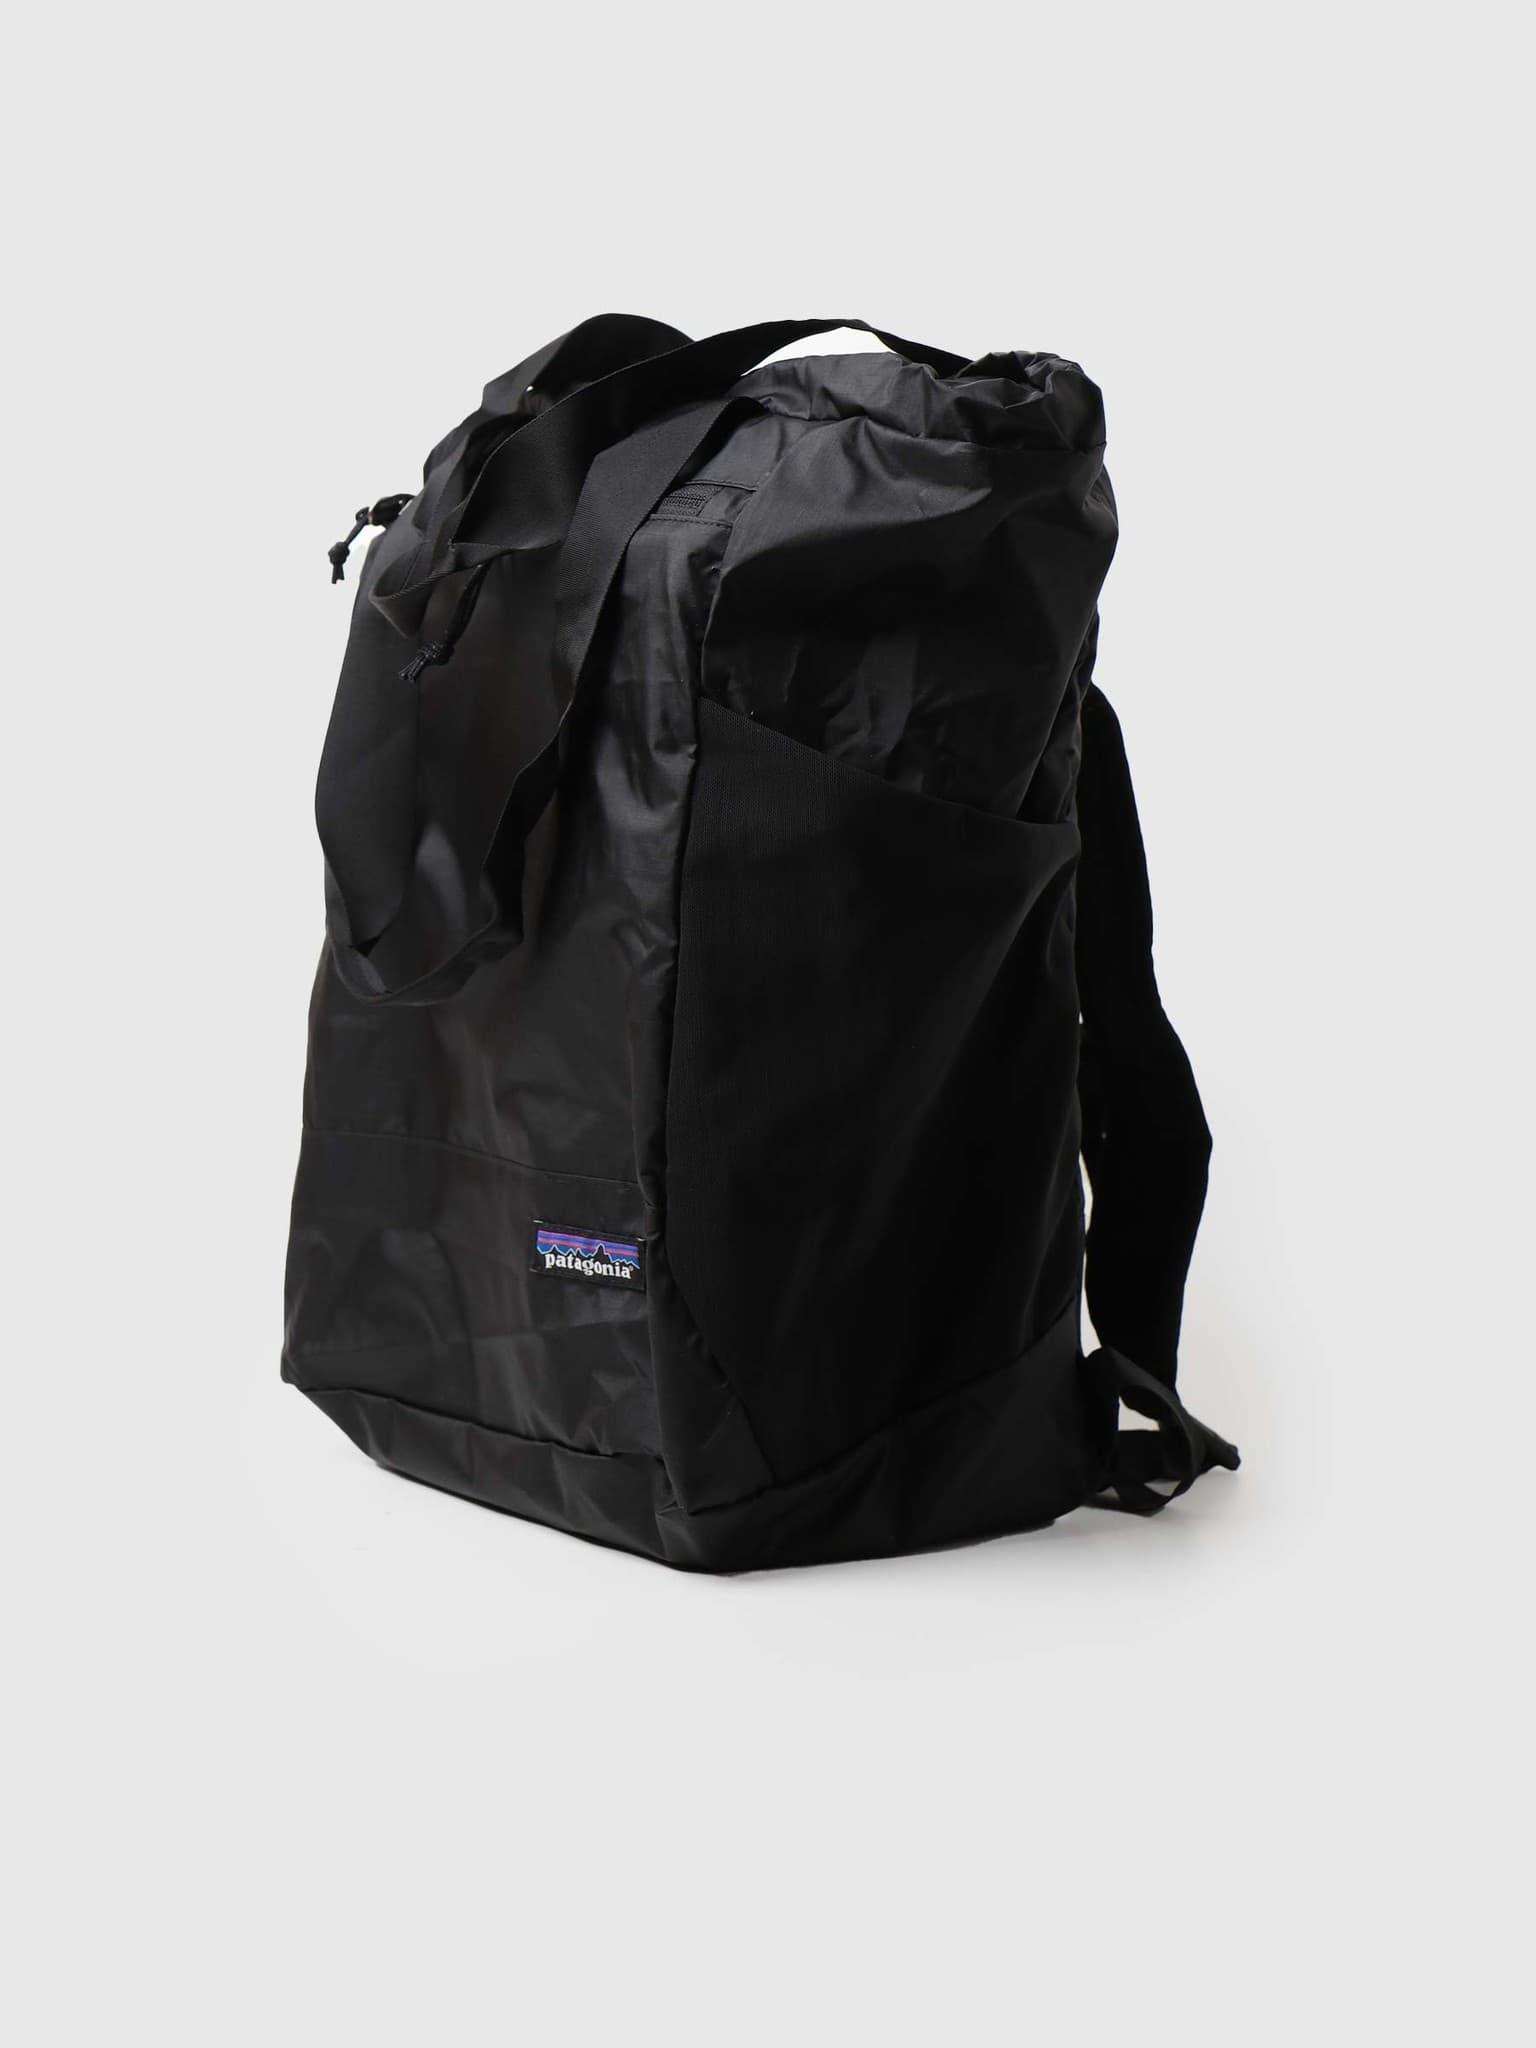 Ultralight Black Hole Tote Pack Black 48809